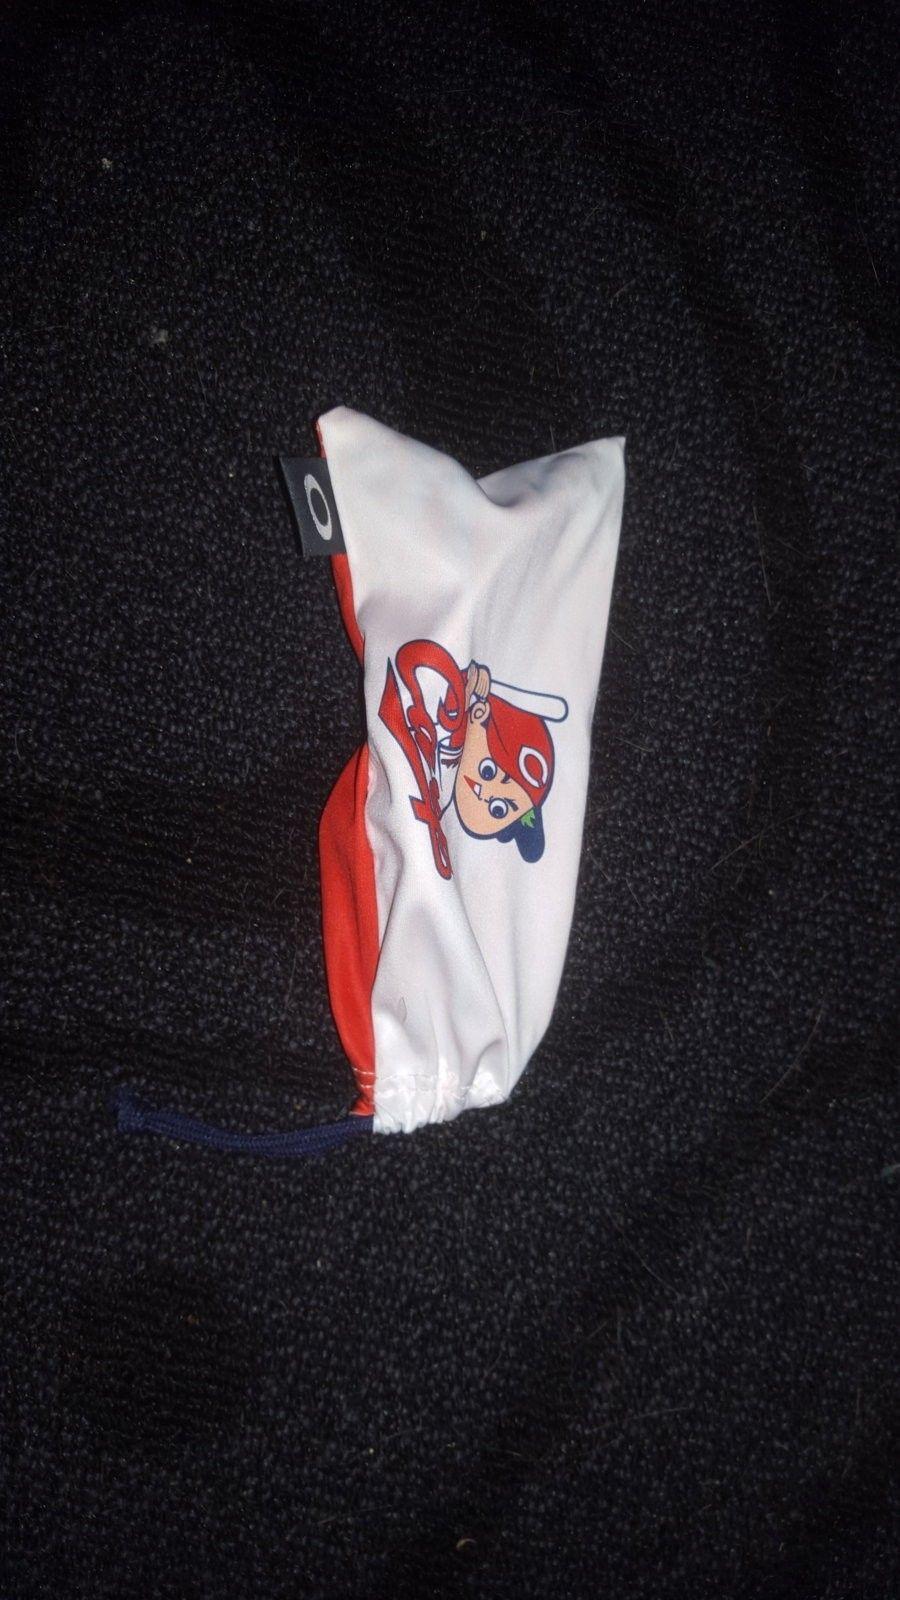 OR TRADE - Brand New - Cincinnati Carp Japanese baseball microbags - 14648290391051157420300.jpg